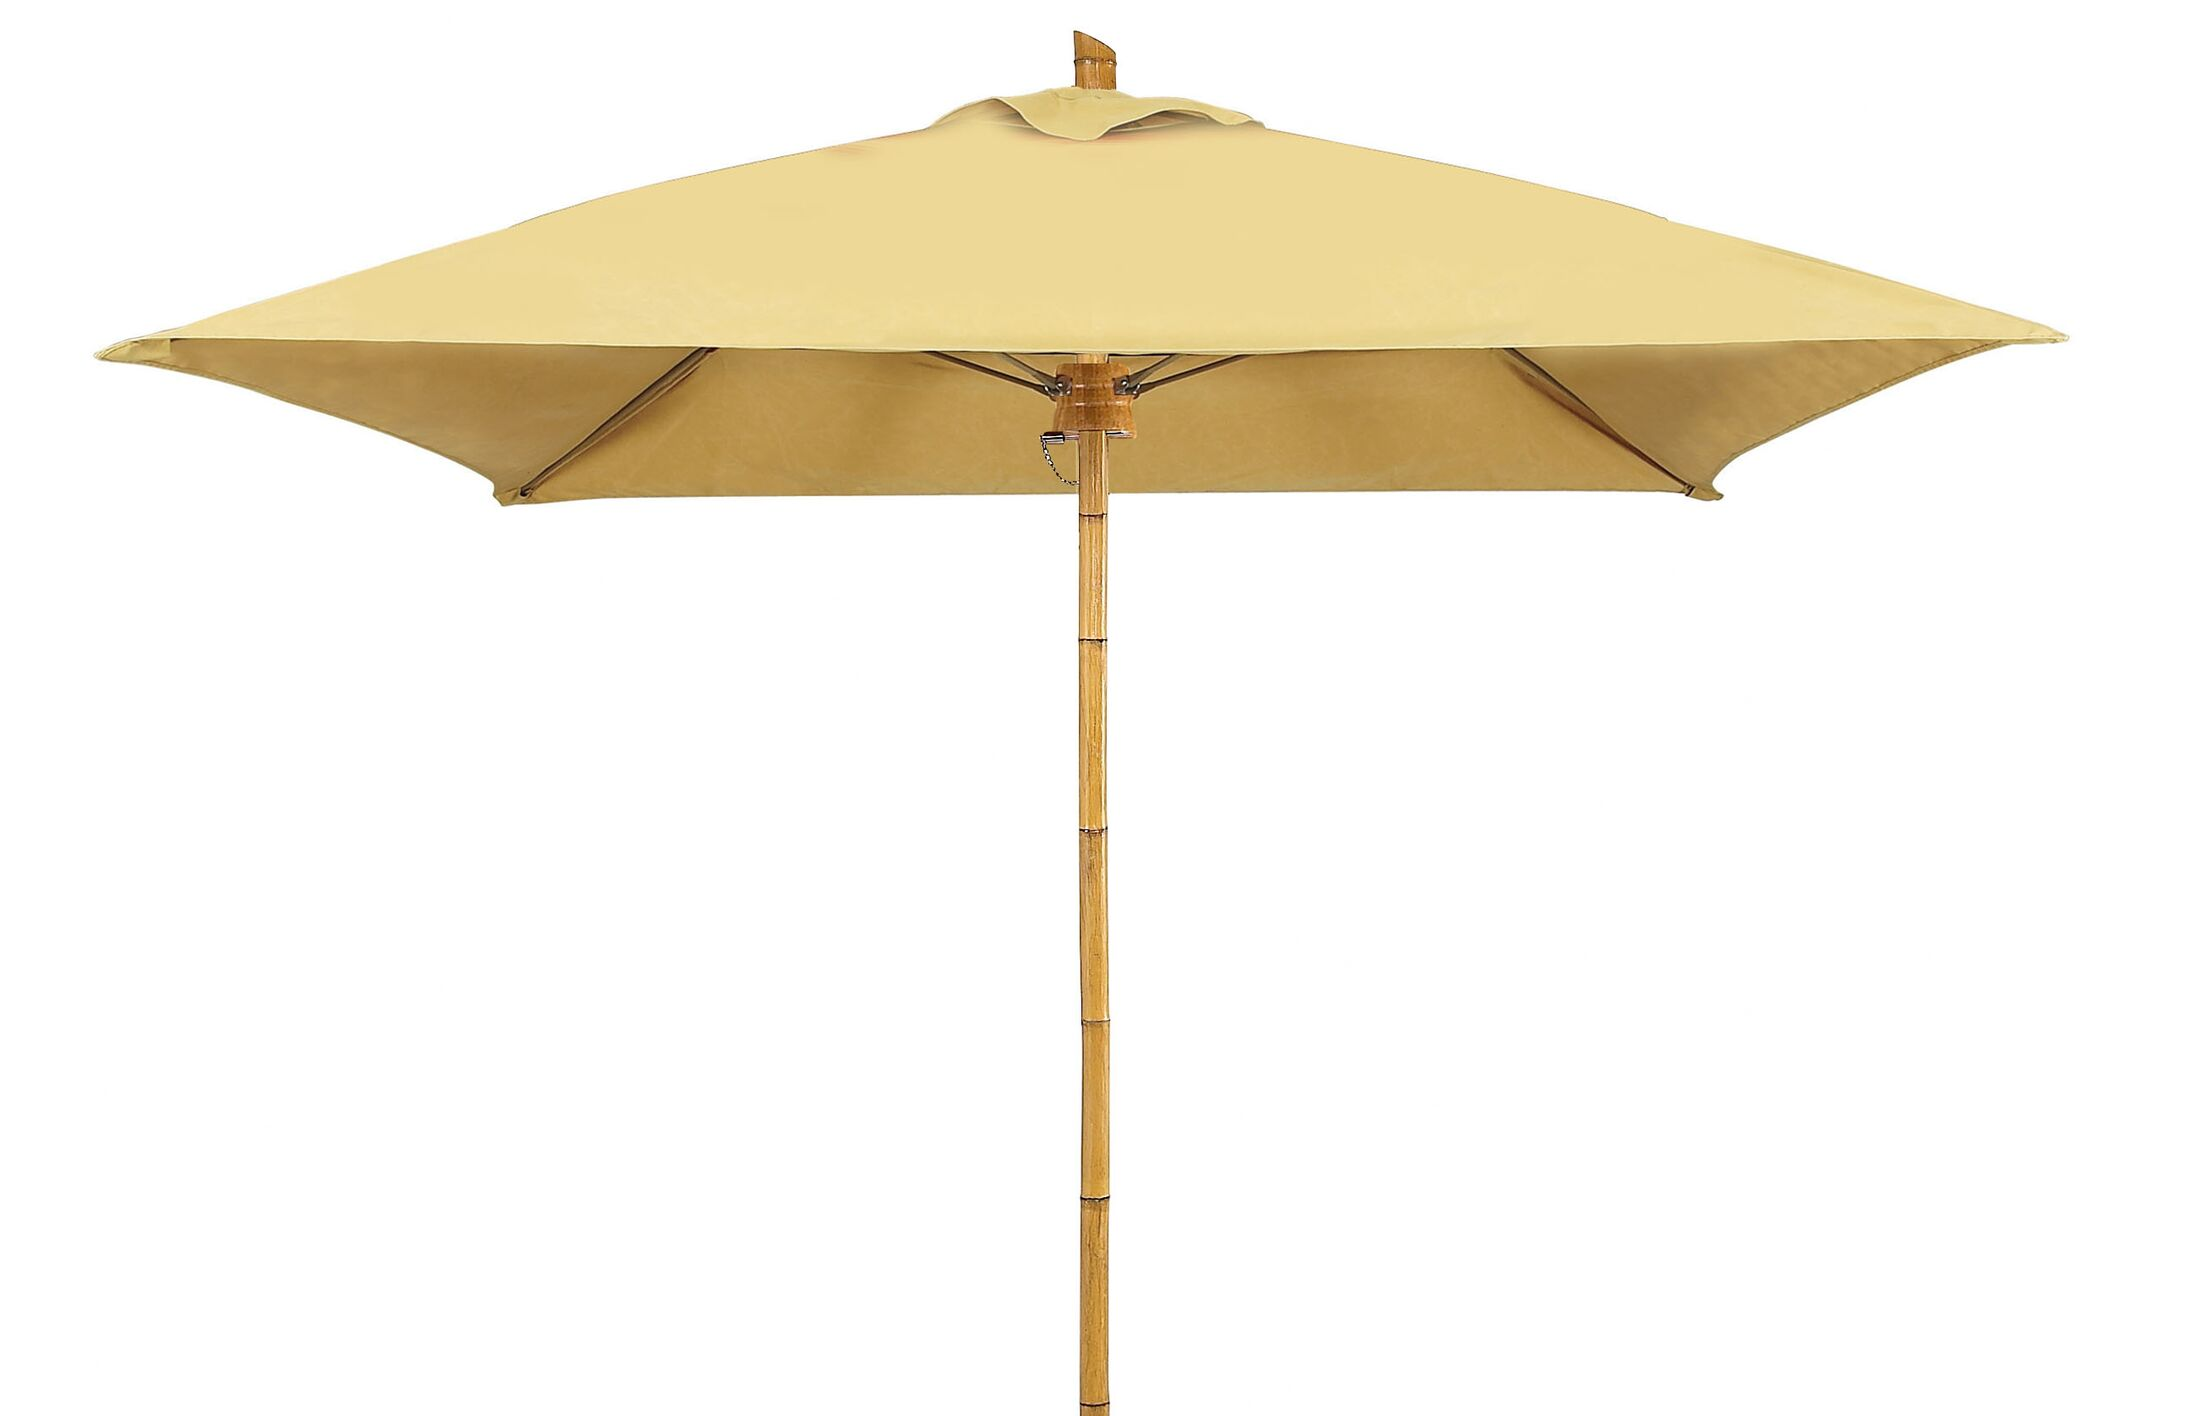 Prestige 7.5' Square Market Umbrella Fabric: Taupe